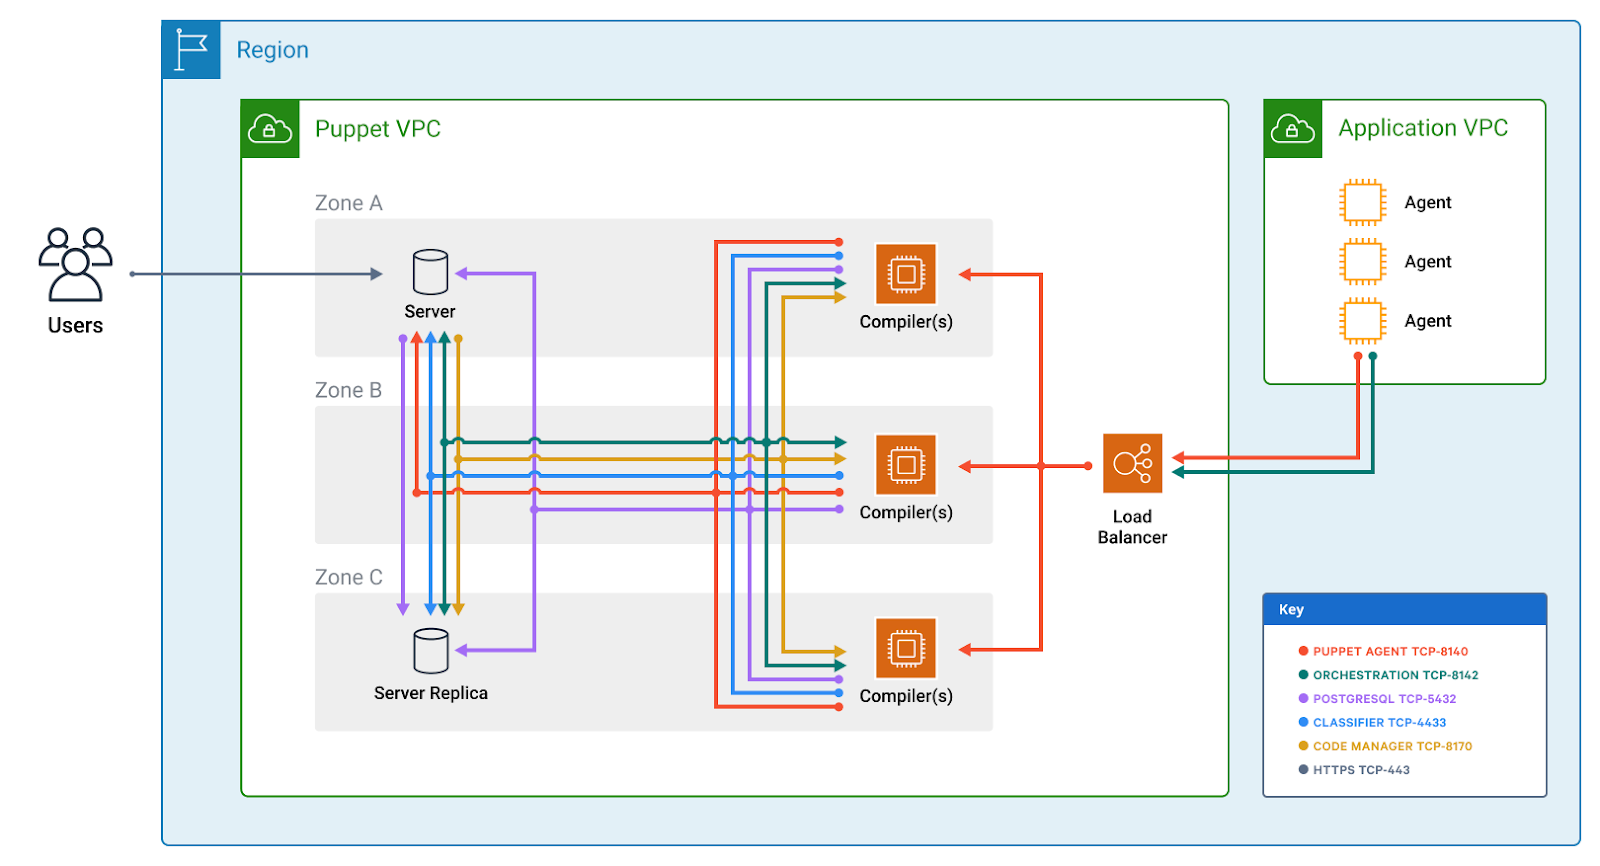 Puppet Enterprise Large Architecture Deployed on AWS